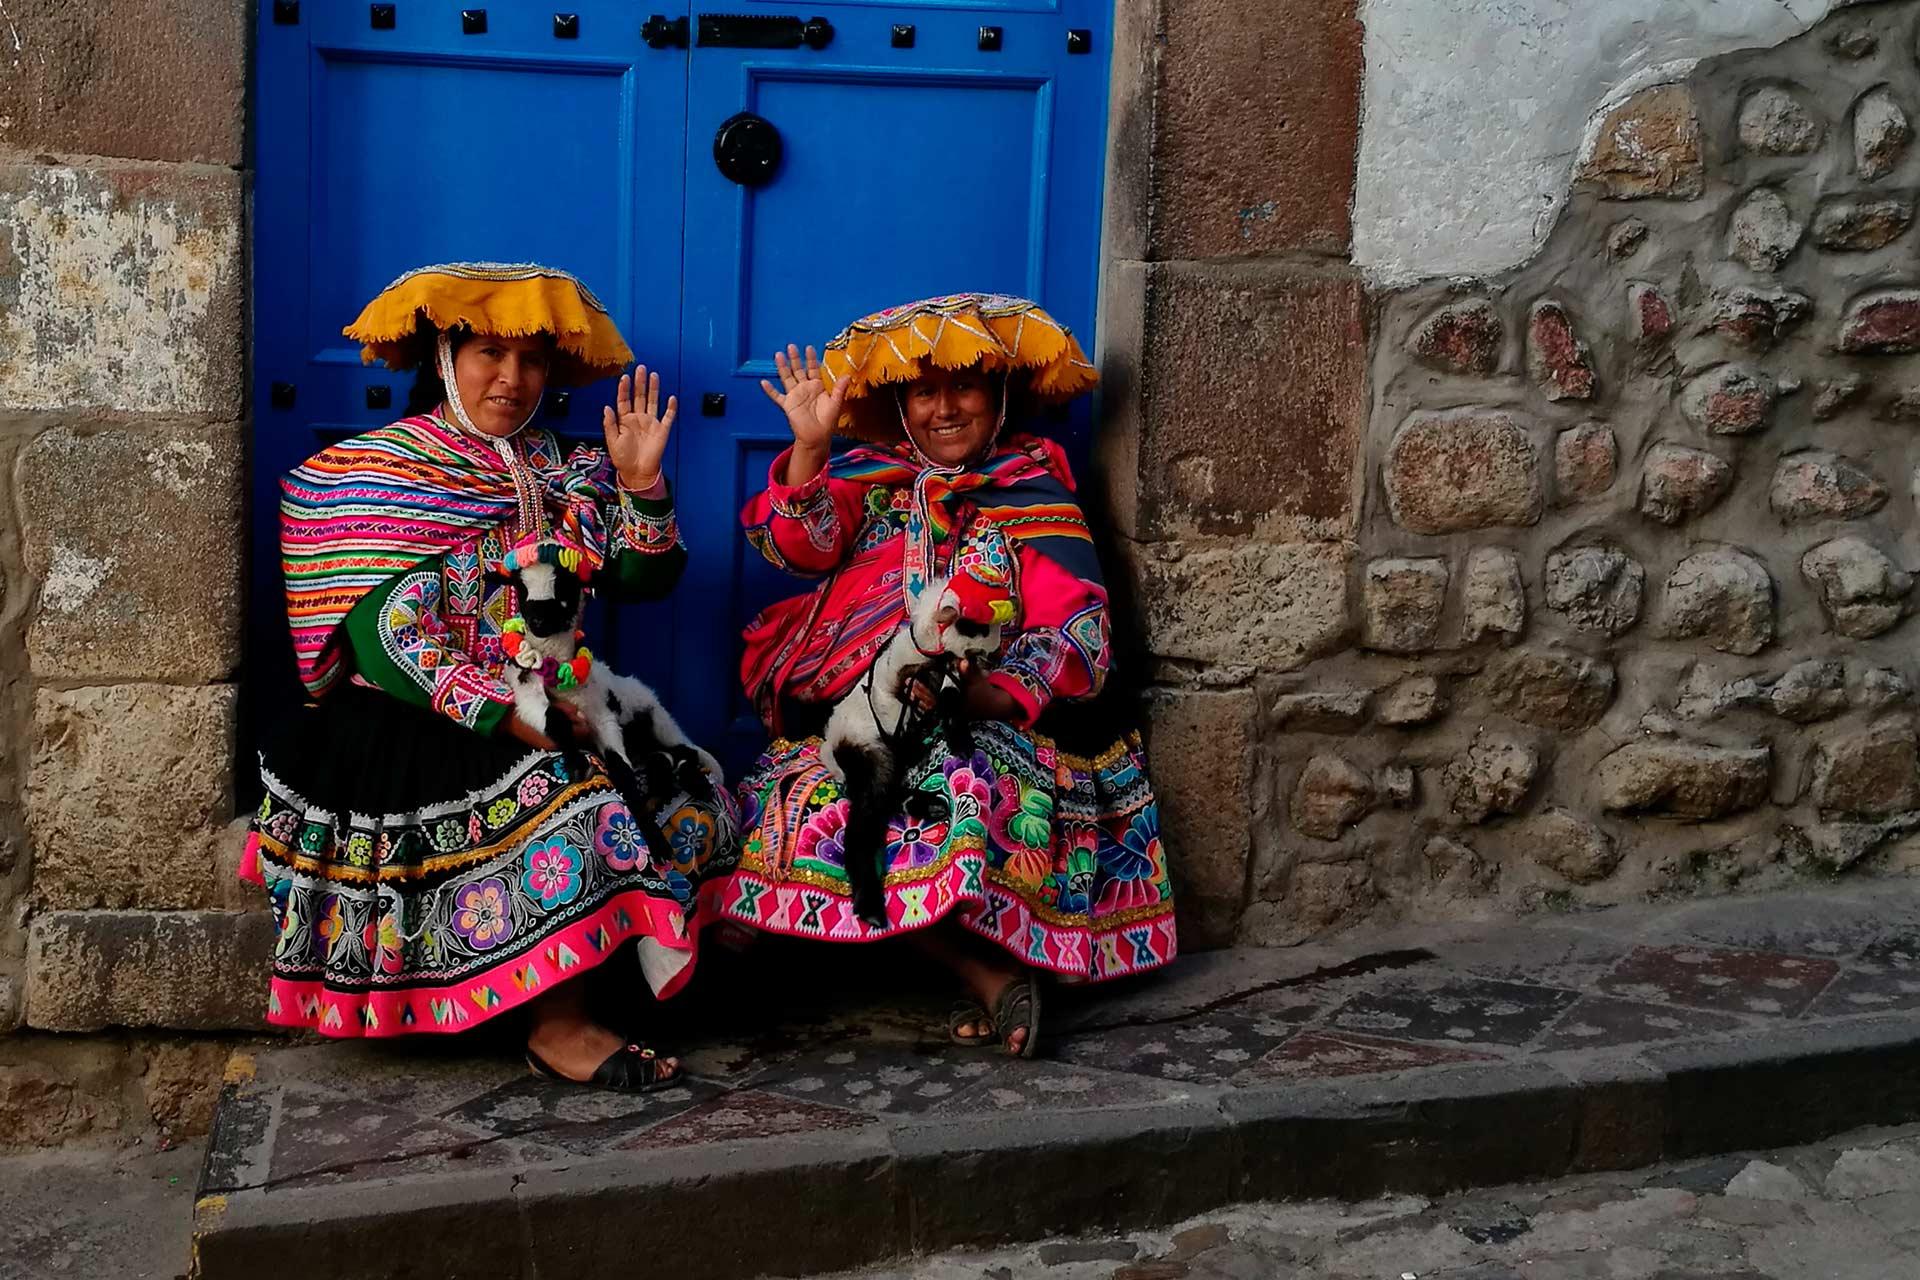 Apprendre l'espagnol au Pérou